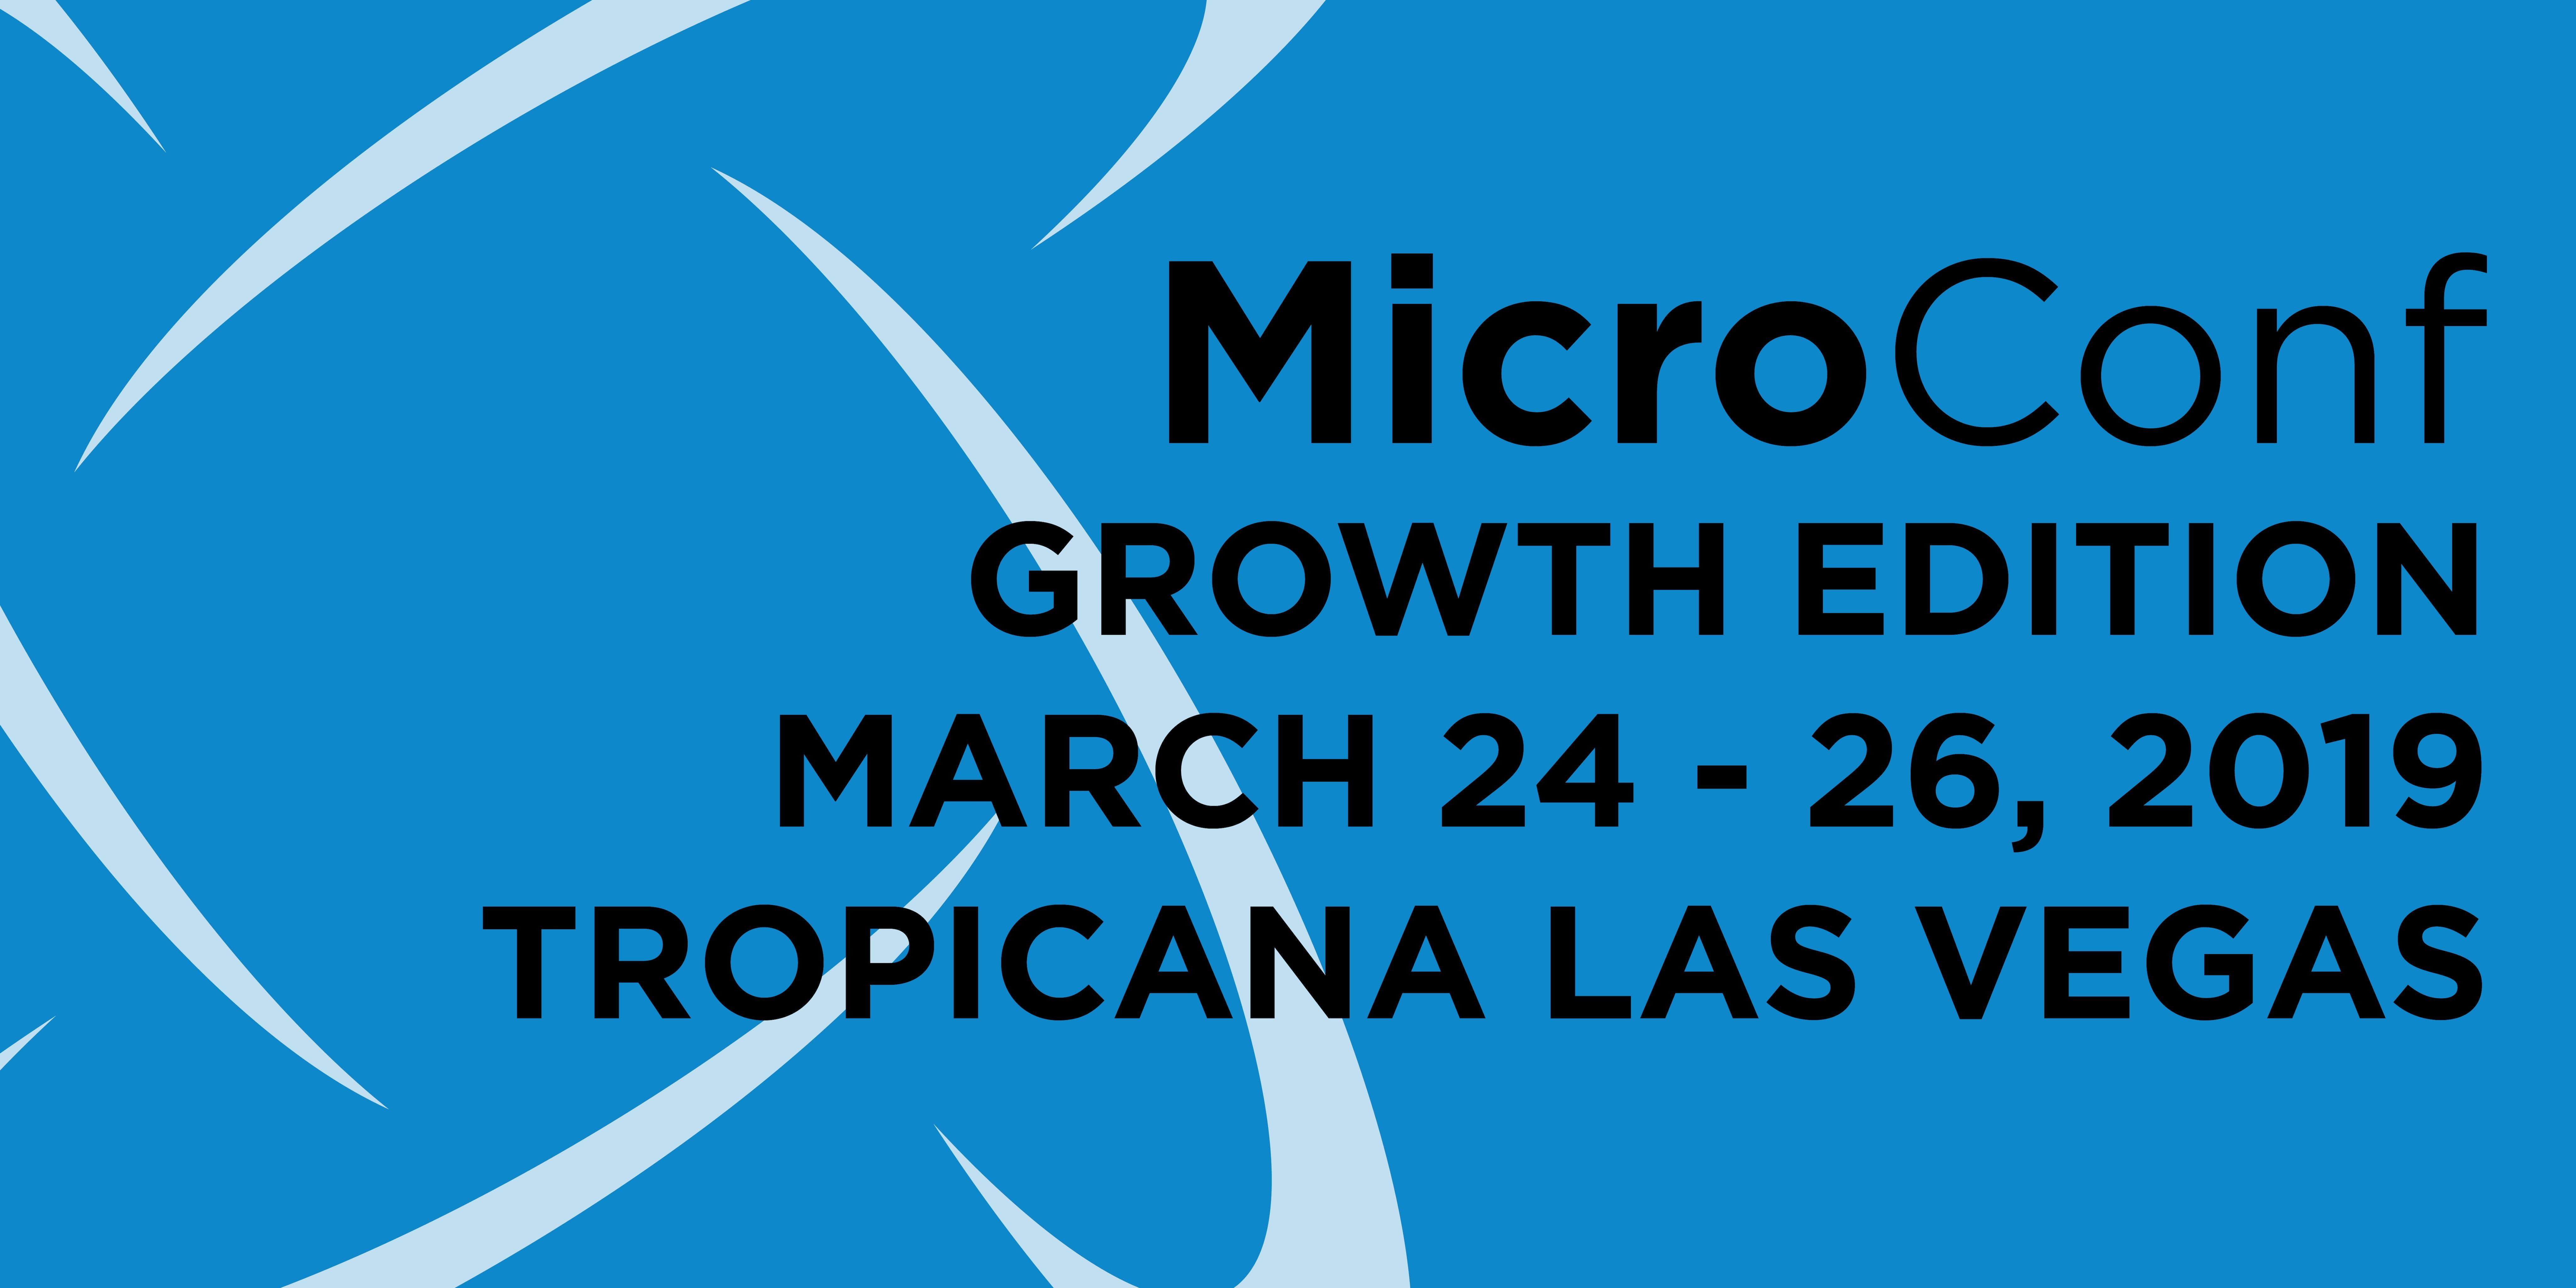 MicroConf: Growth Edition 2019